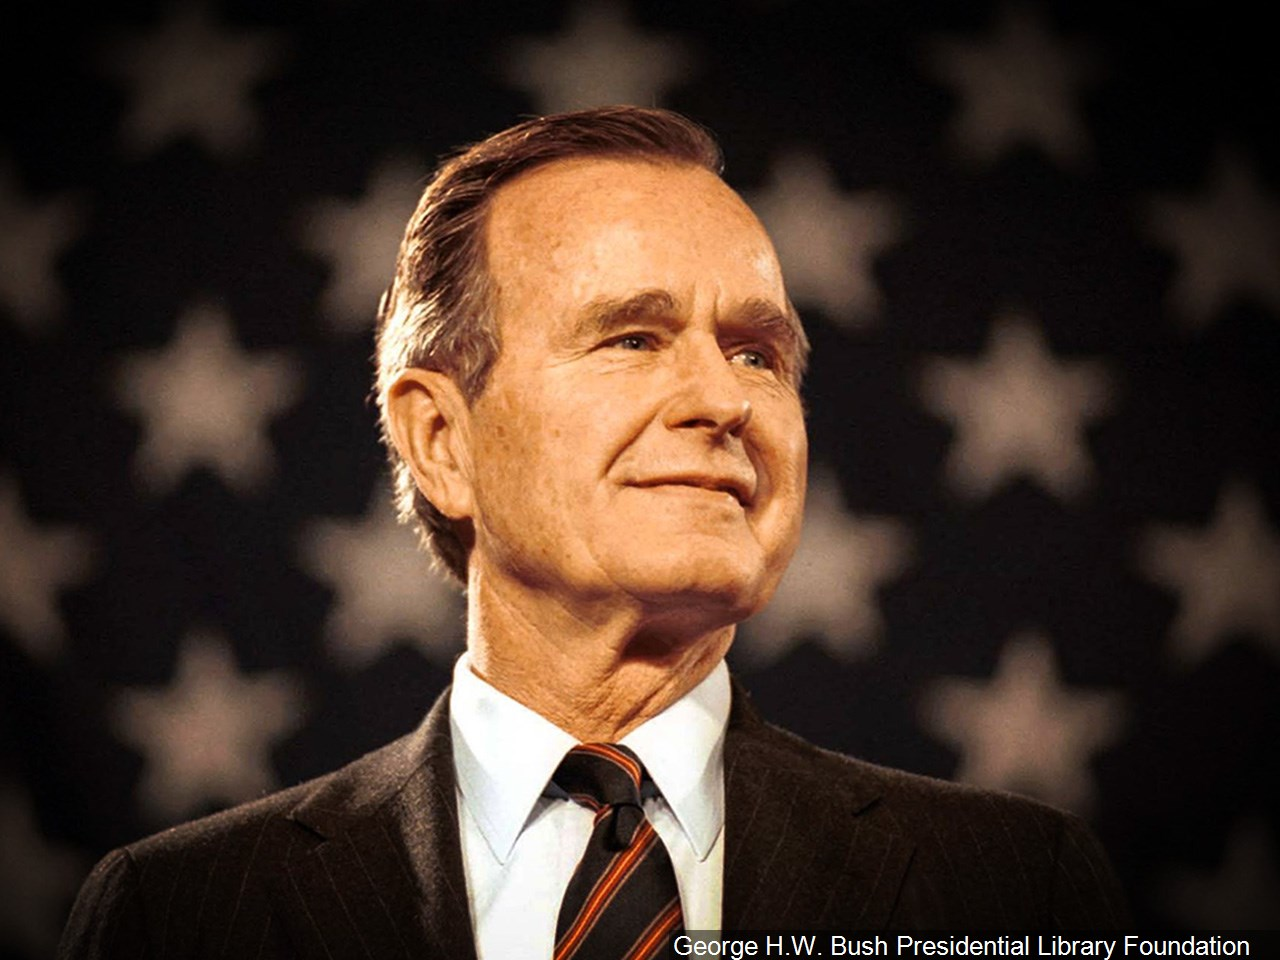 Photo: George H.W. Bush Presidential Library Foundation (Tribune News Service | MCT Direct)